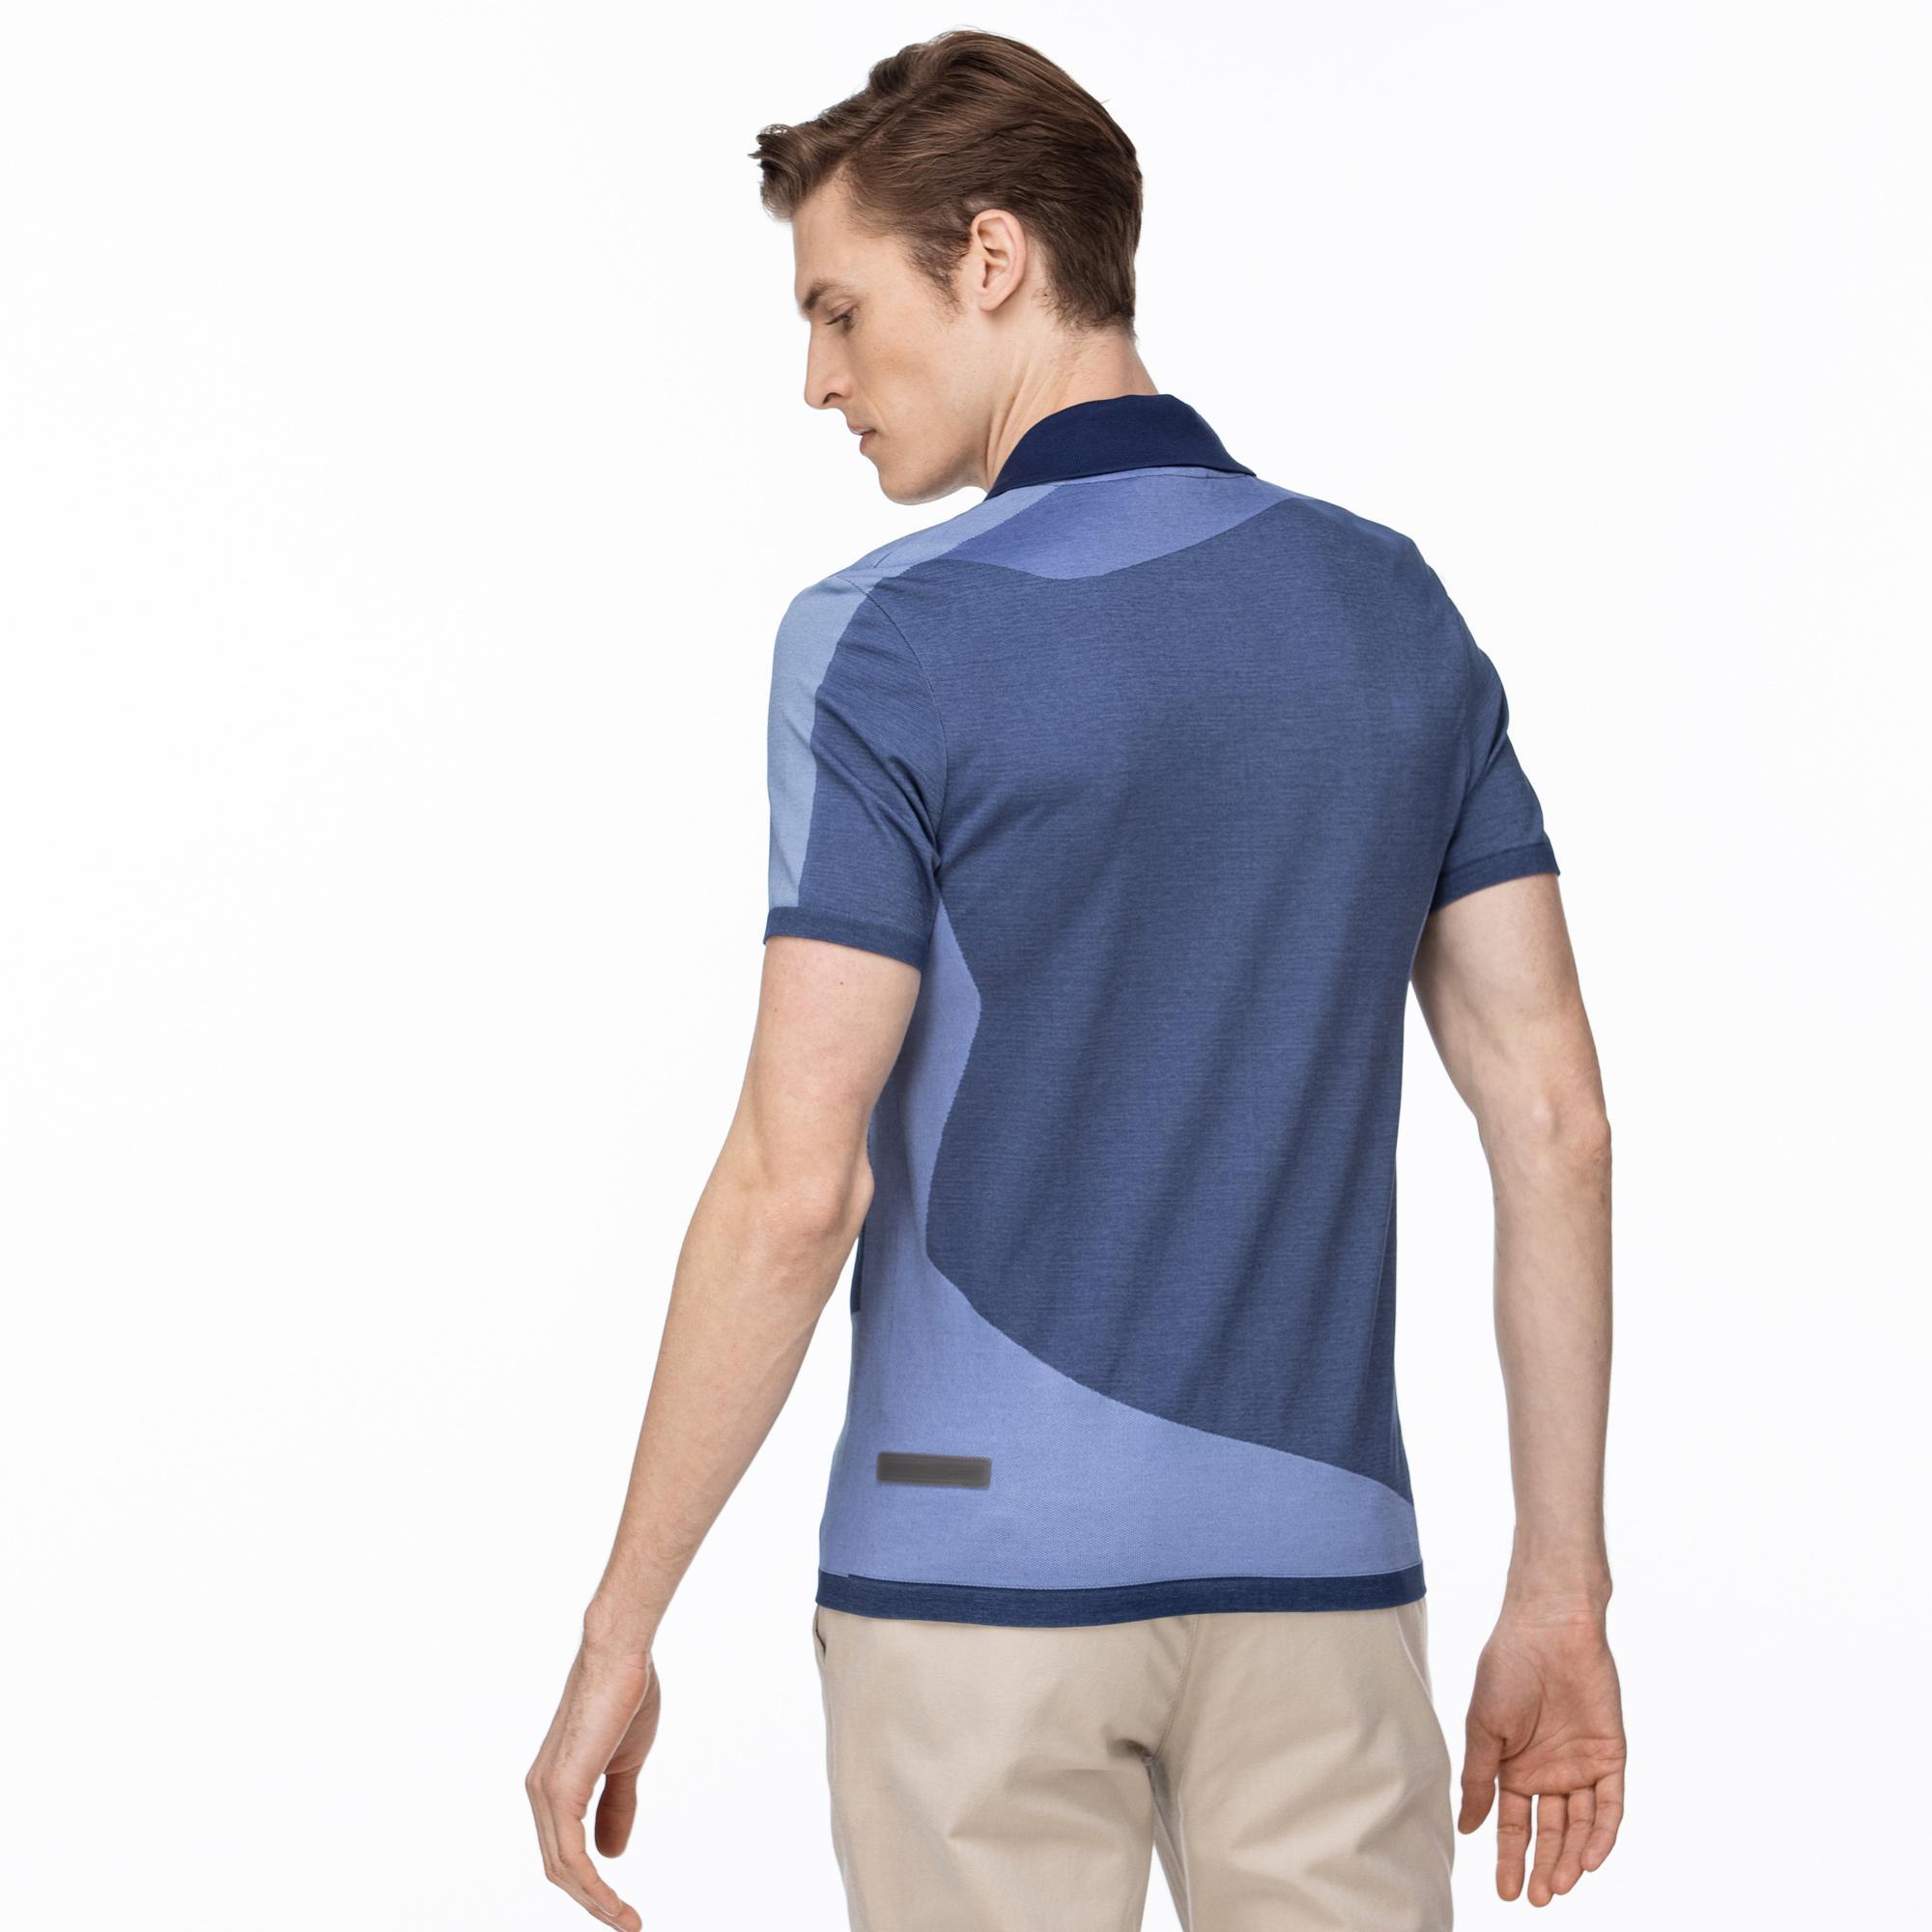 Lacoste Męska Ergonomiczna Koszulka Polo Motion